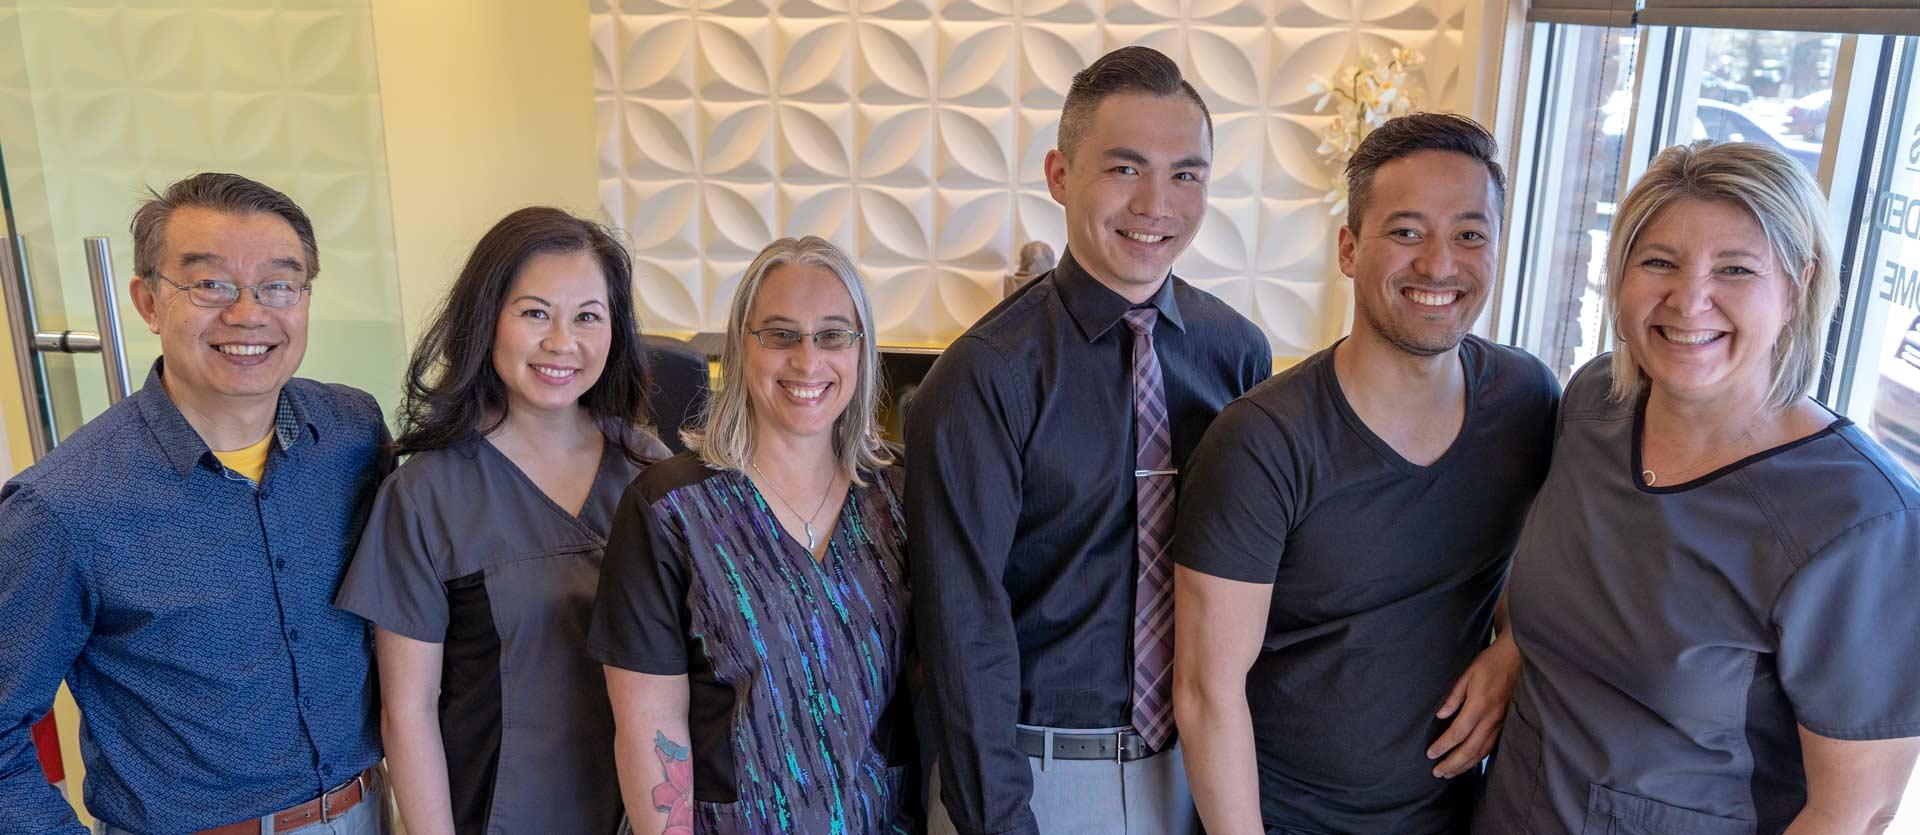 Northern Hills Chiropractic Team